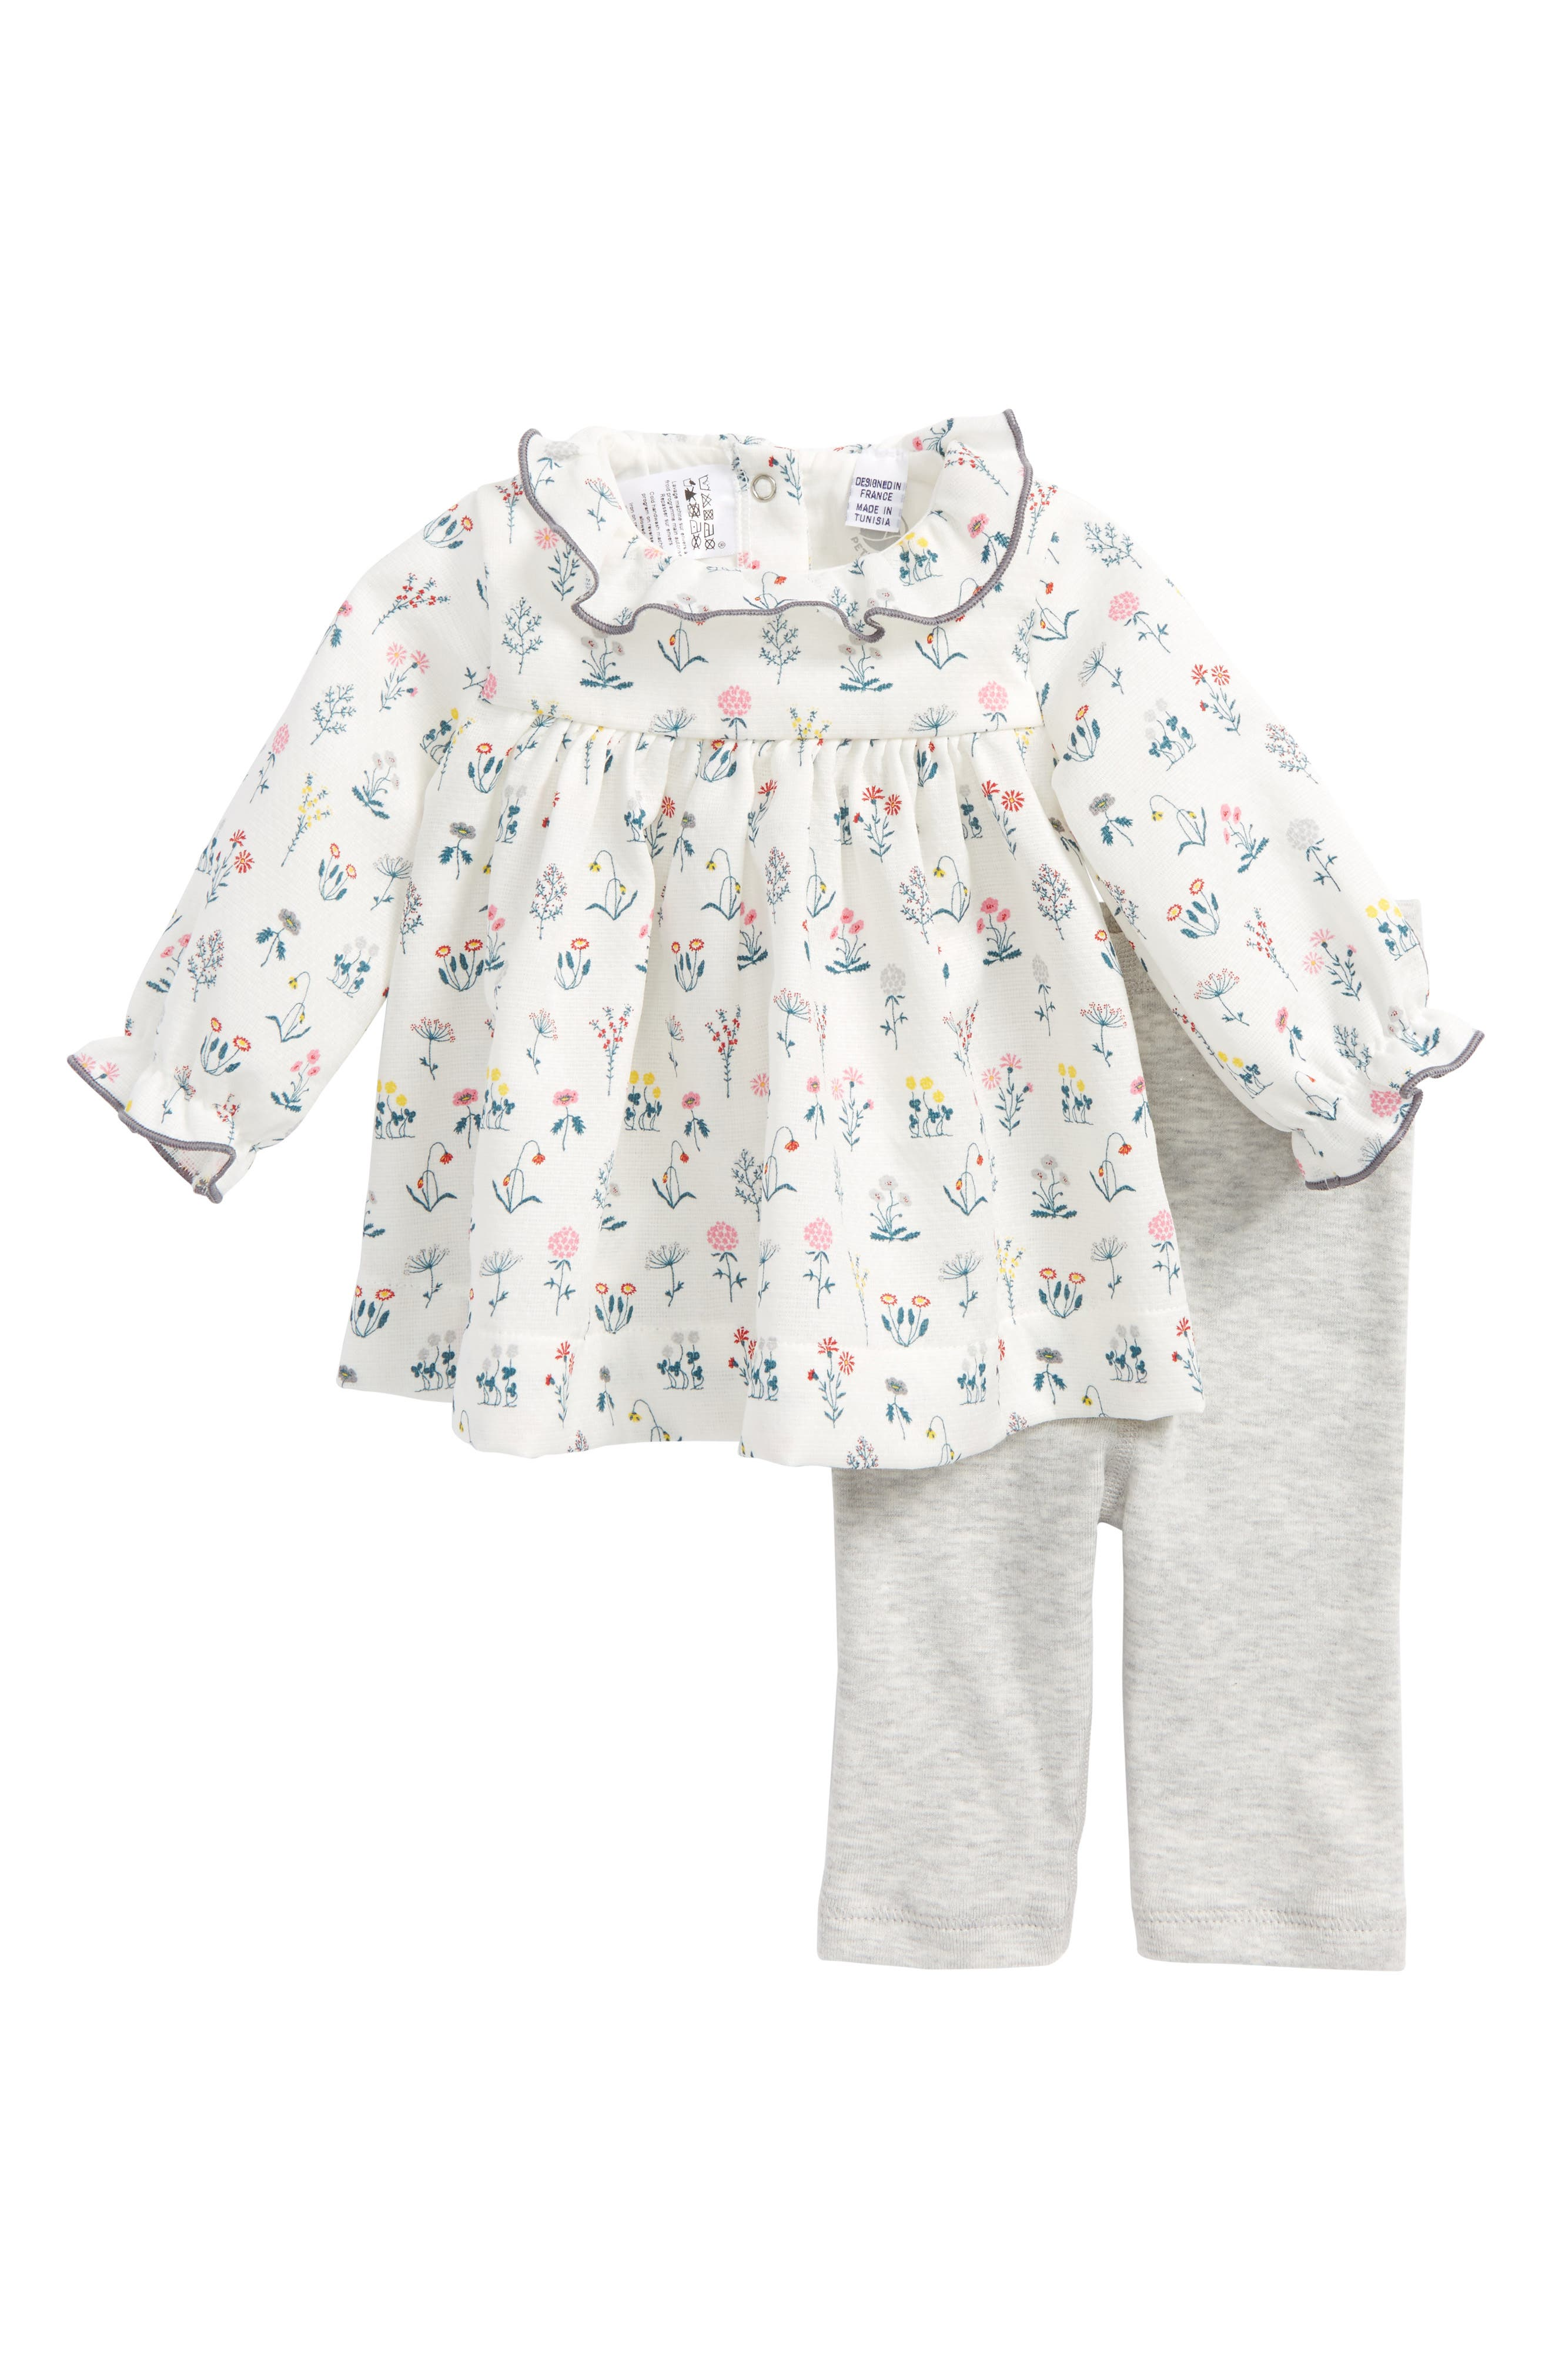 Floral Print Dress & Leggings Set,                             Main thumbnail 1, color,                             White/ Grey